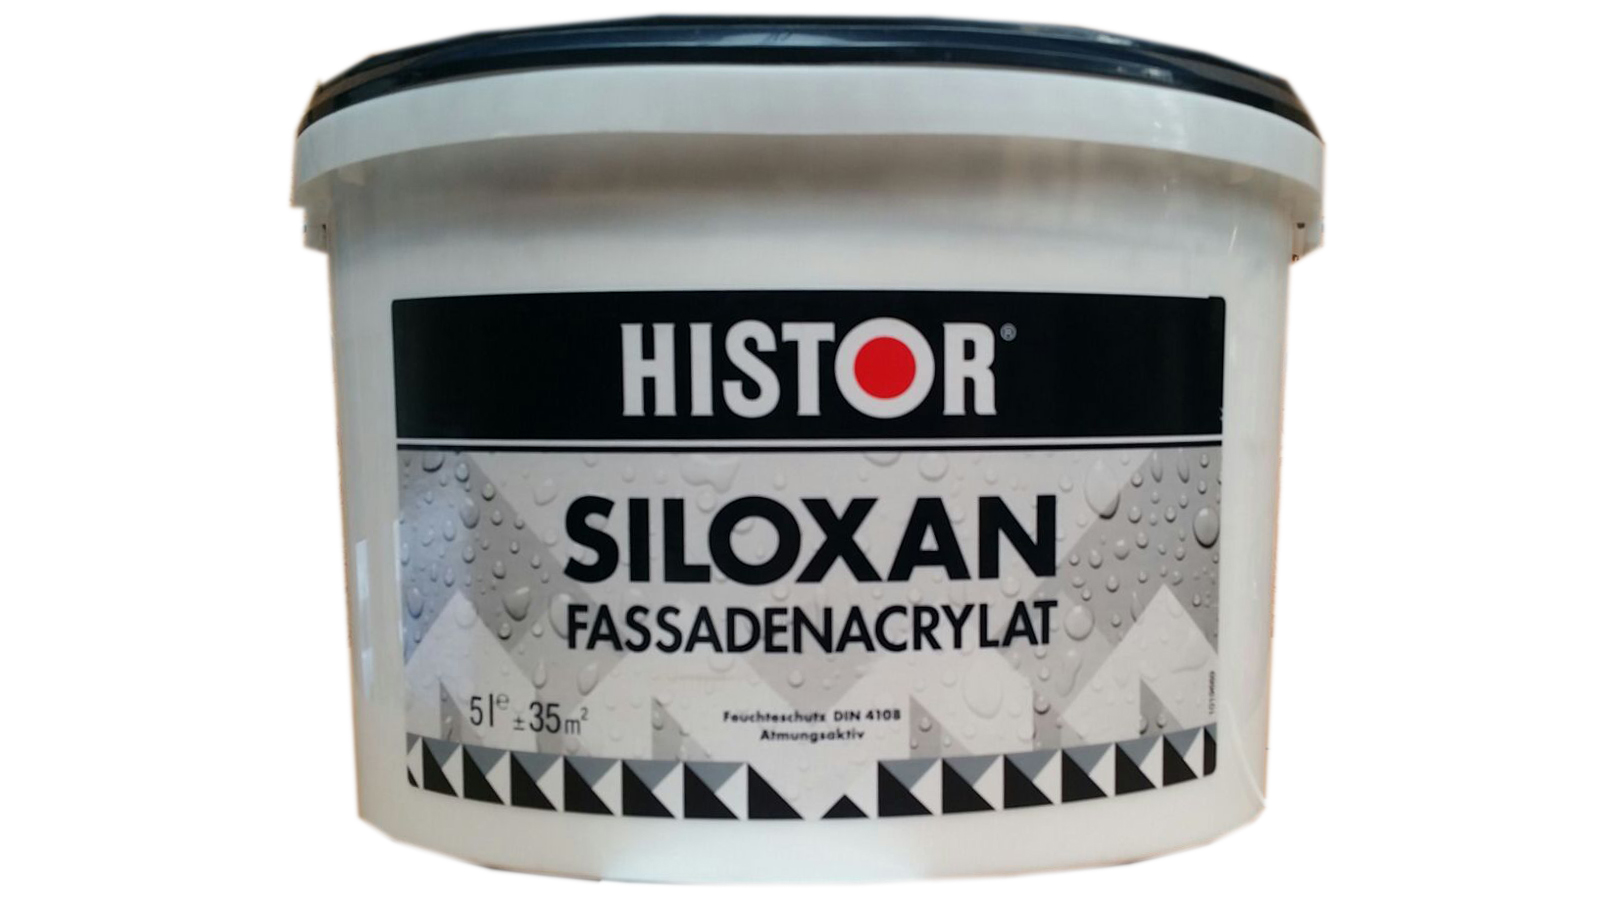 Histor SILOXAN Fassadenacrylat Fassadenfarbe Weiß TuchMatt 5 L